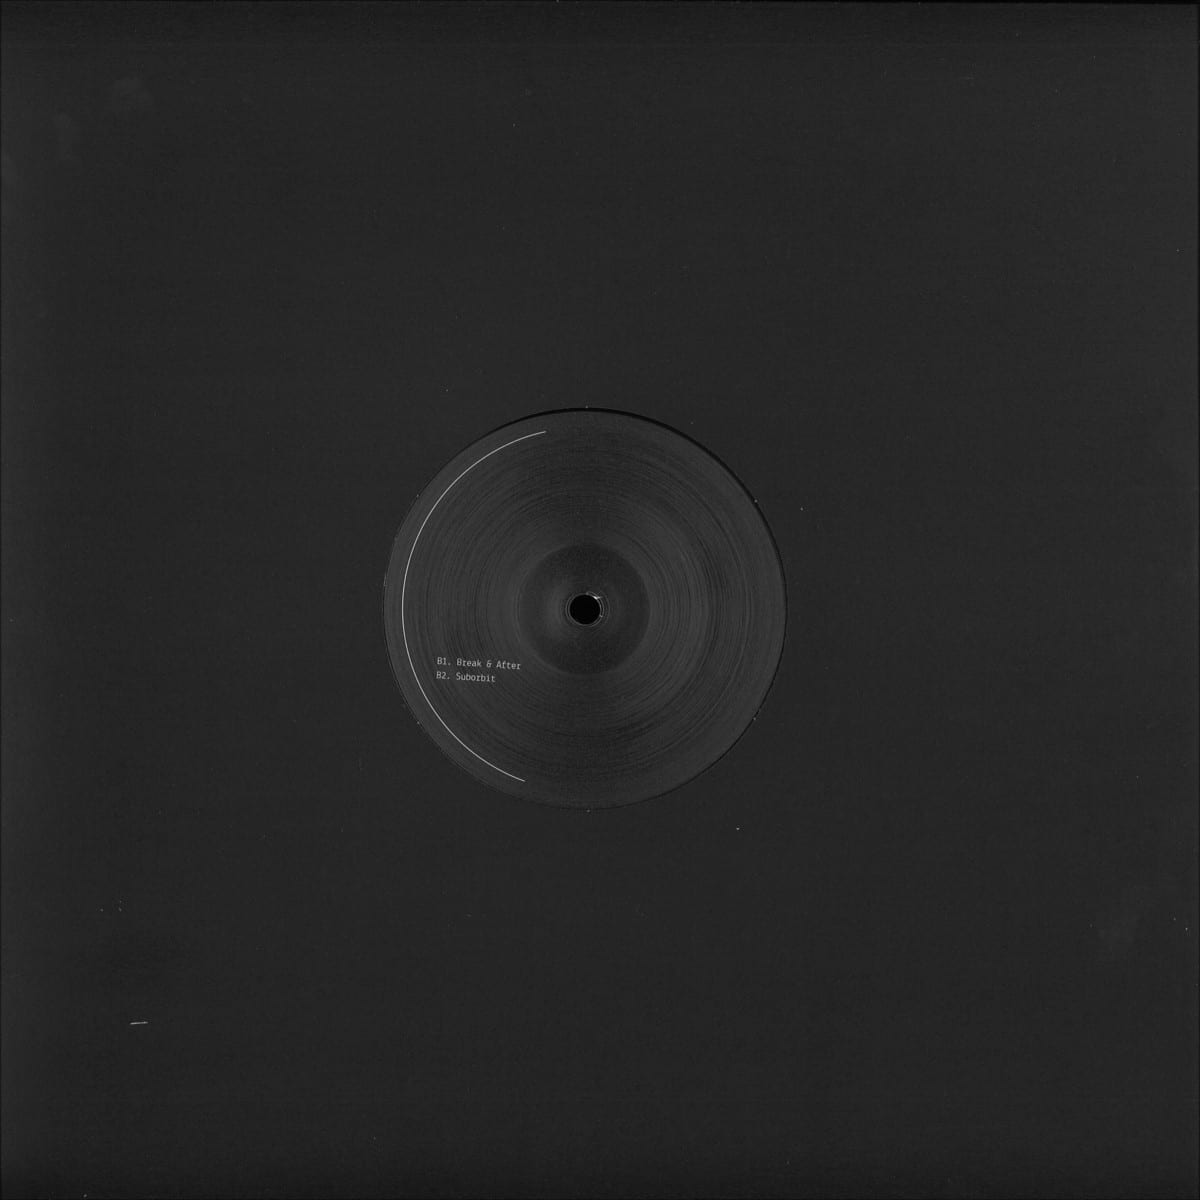 floog - atipic lab 03 [atipic] 2